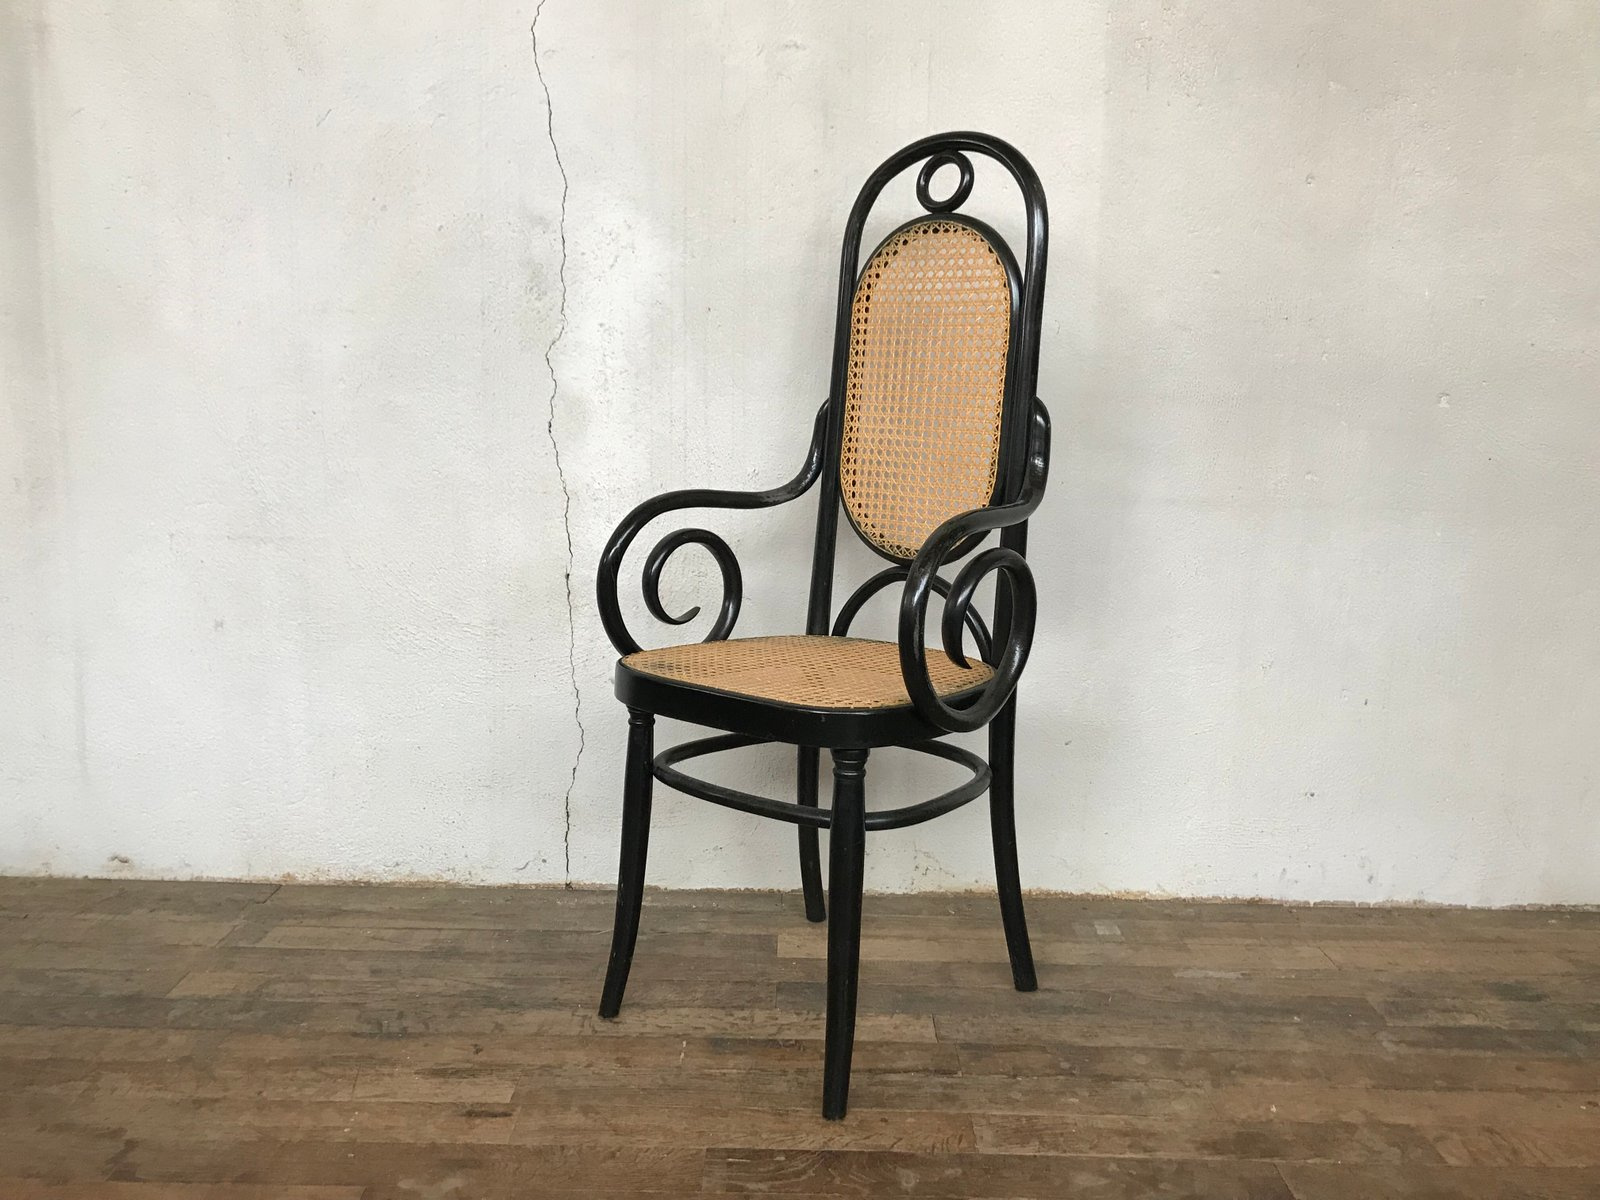 Antiker rumänischer Thonet Sessel aus Bugholz von Jacob & Joseph Kohn